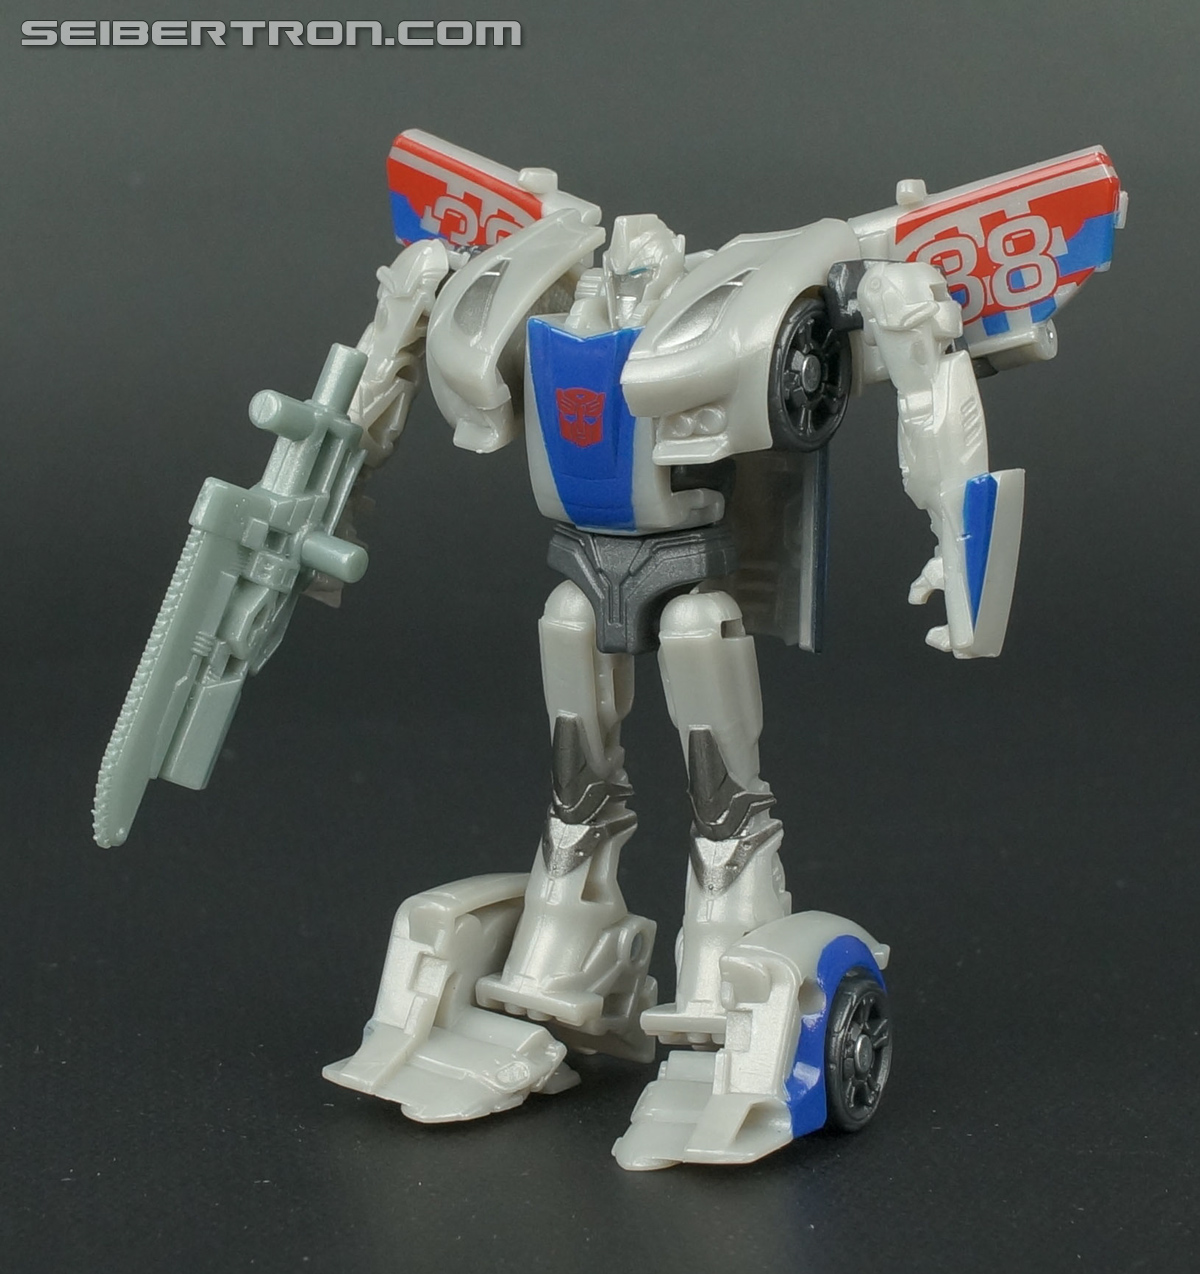 Transformers Prime Beast Hunters Cyberverse Smokescreen (Image #58 of 93)